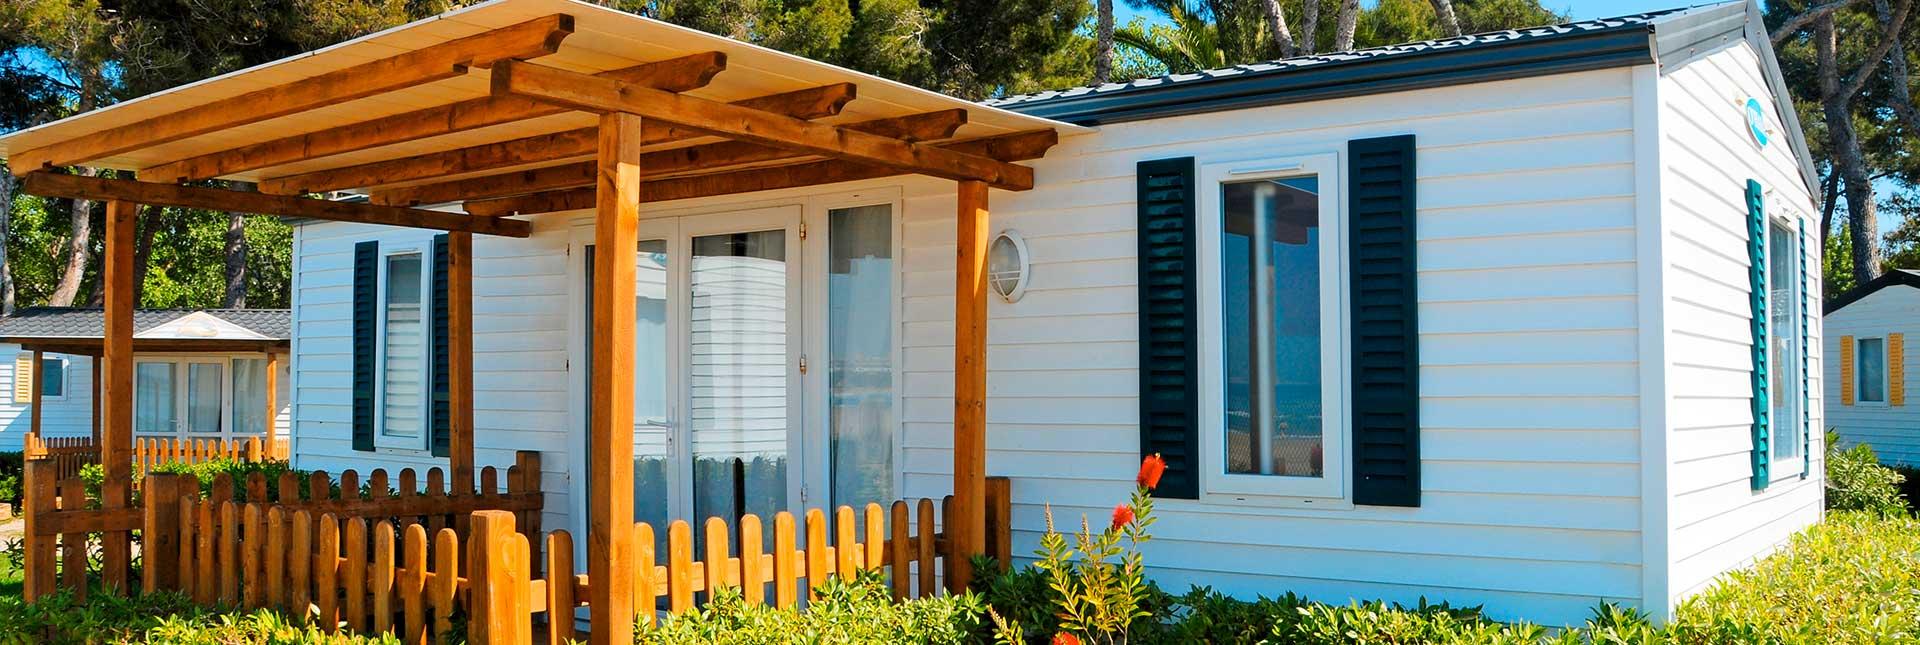 Mobile Homes For Sale Anna Maria Island Florida